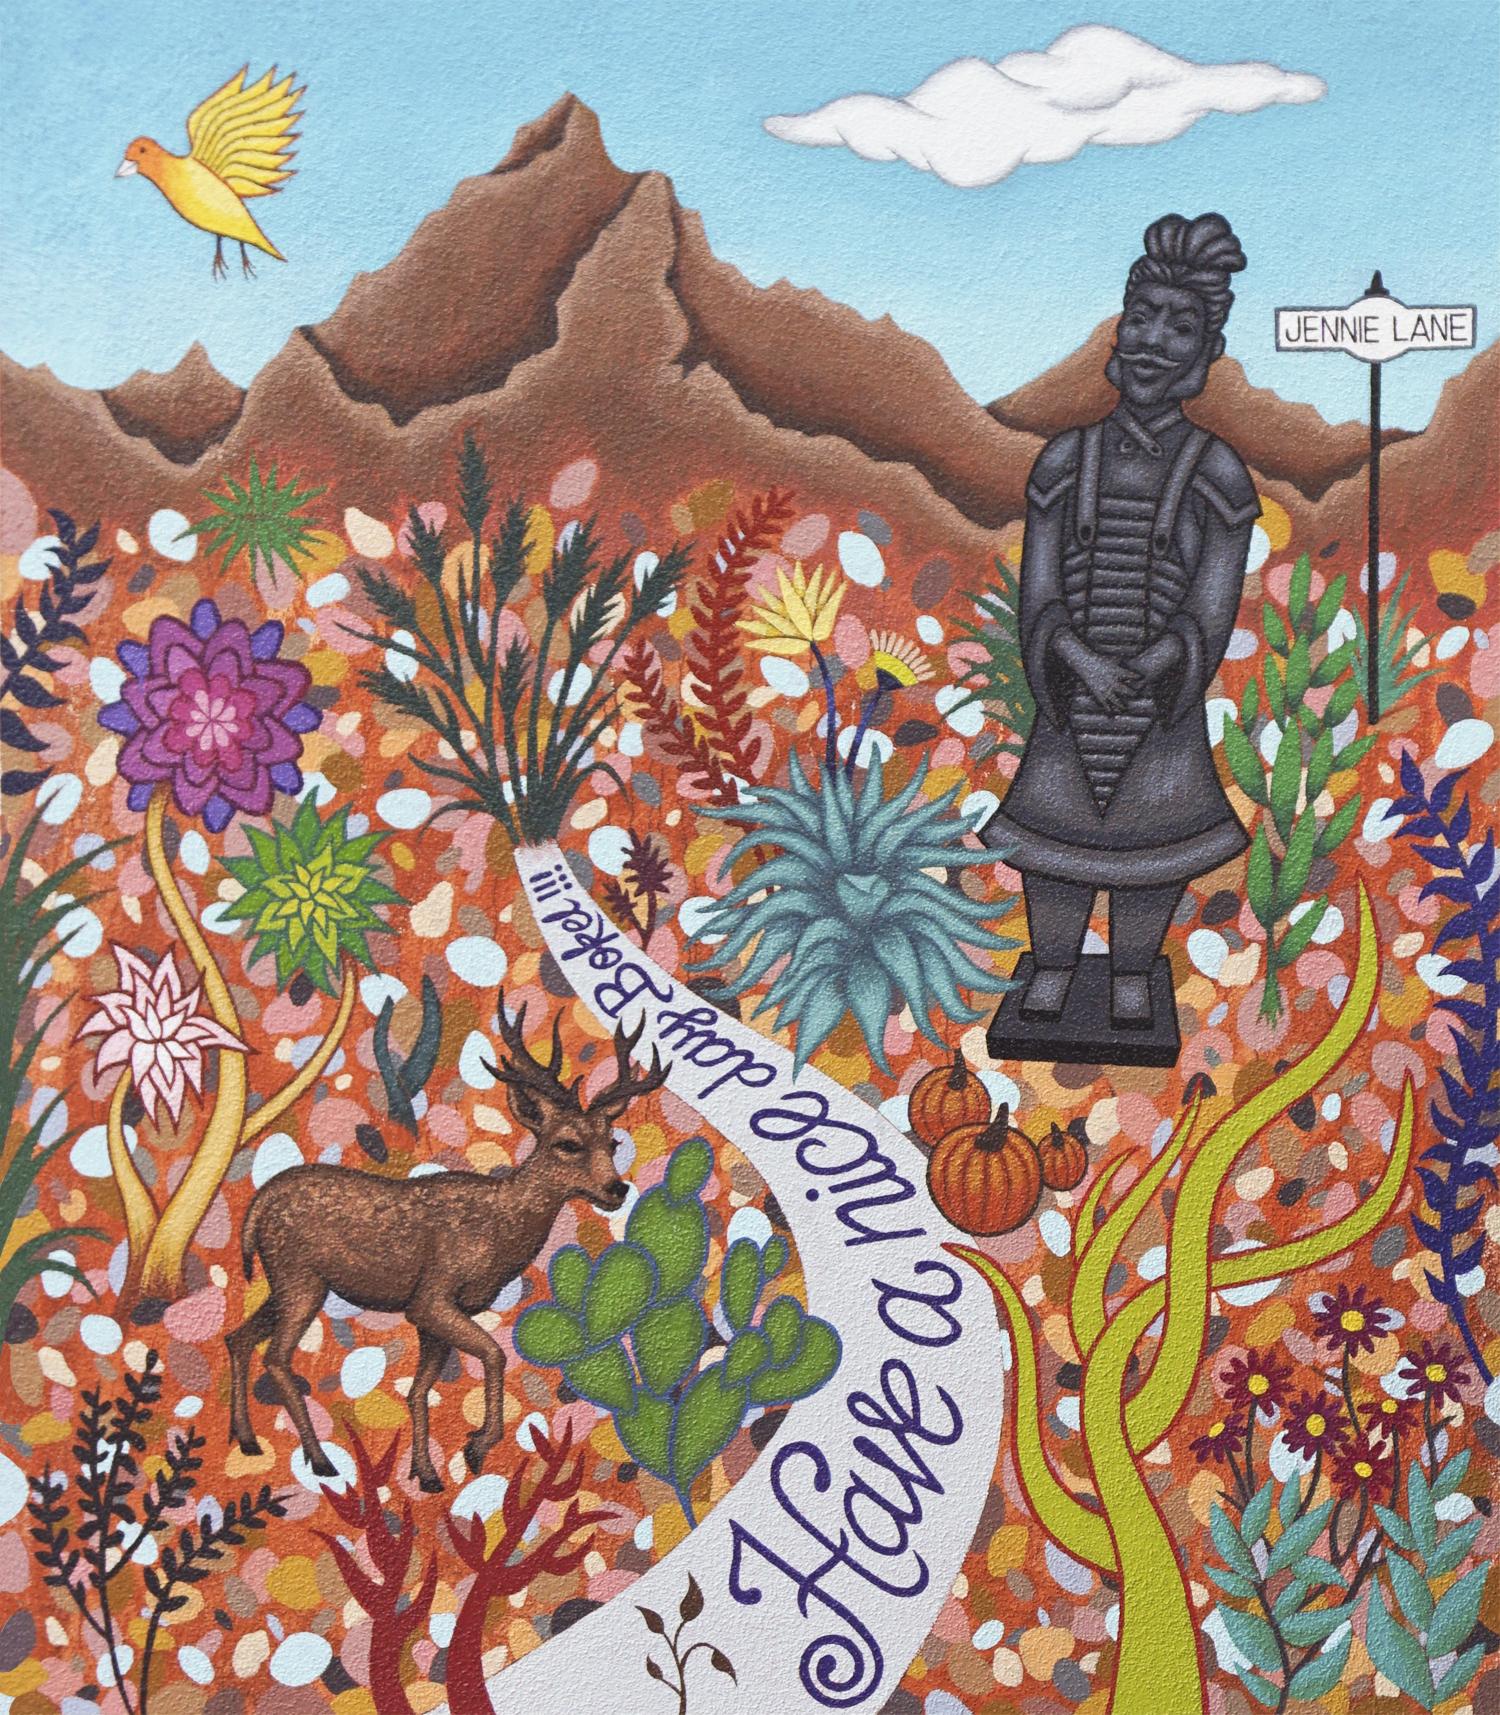 2017-Jeaneen Carlino-Mural Art-Painting-Garden of Laurel Canyon-1.jpg